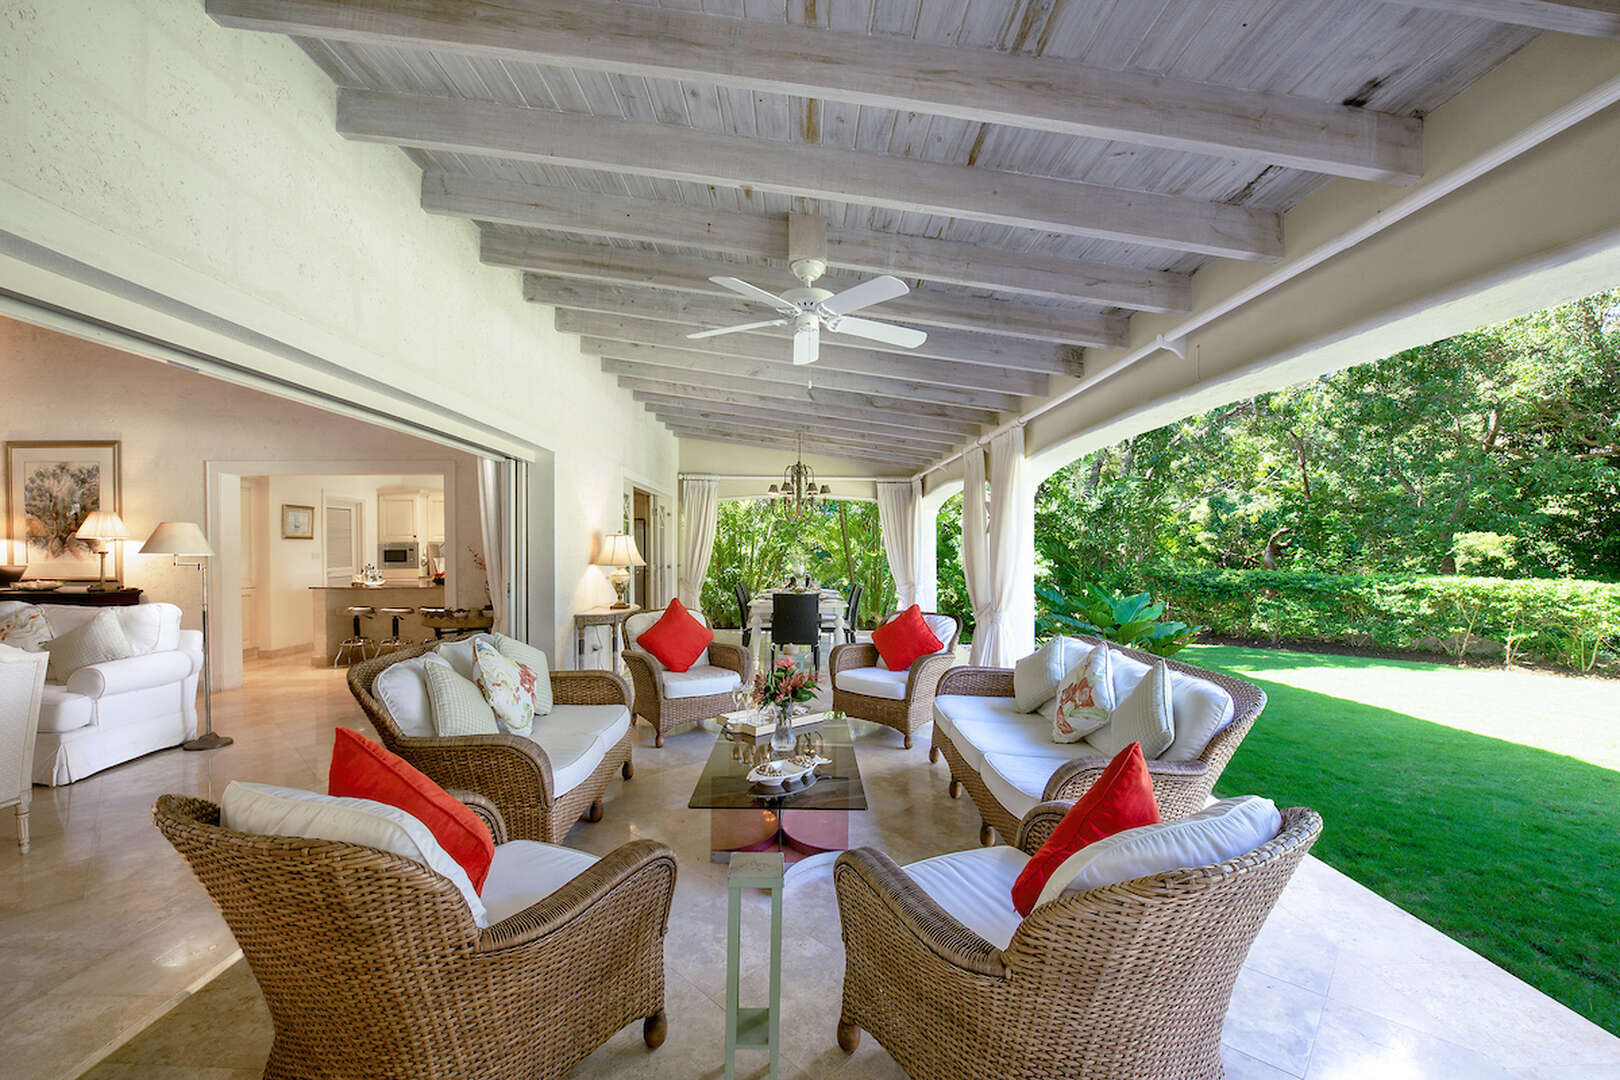 - Villa One Greentails - Image 1/22